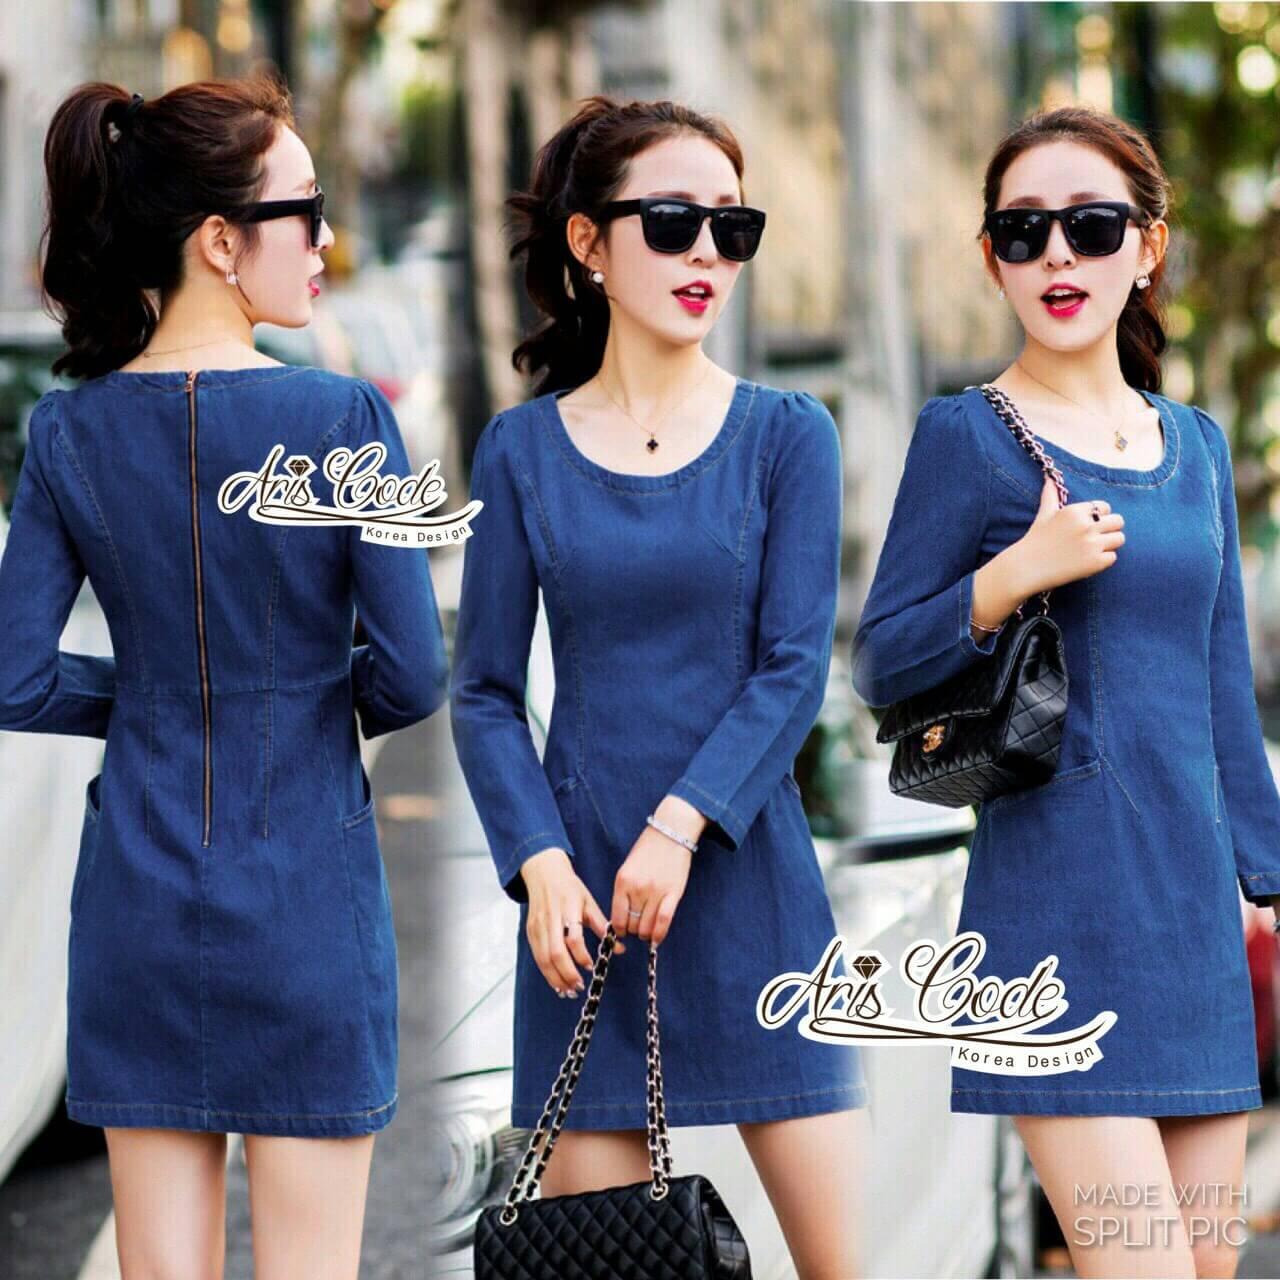 Slim thin long-sleeved dress denim skirt denim by Aris Code A243-79C05